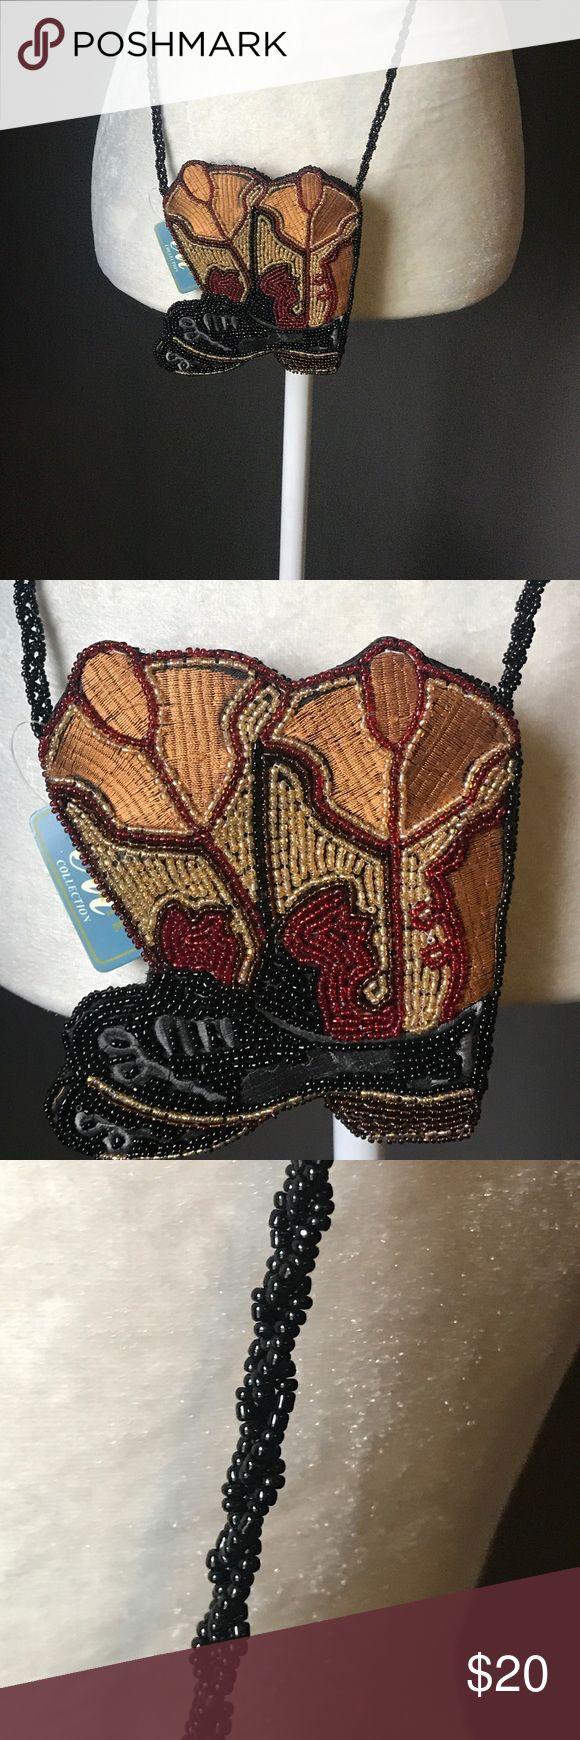 C&W nwt Beaded cowboy boot change purse Perfect brand new beaded cowboy boot cross body change purse Bags Crossbody Bags